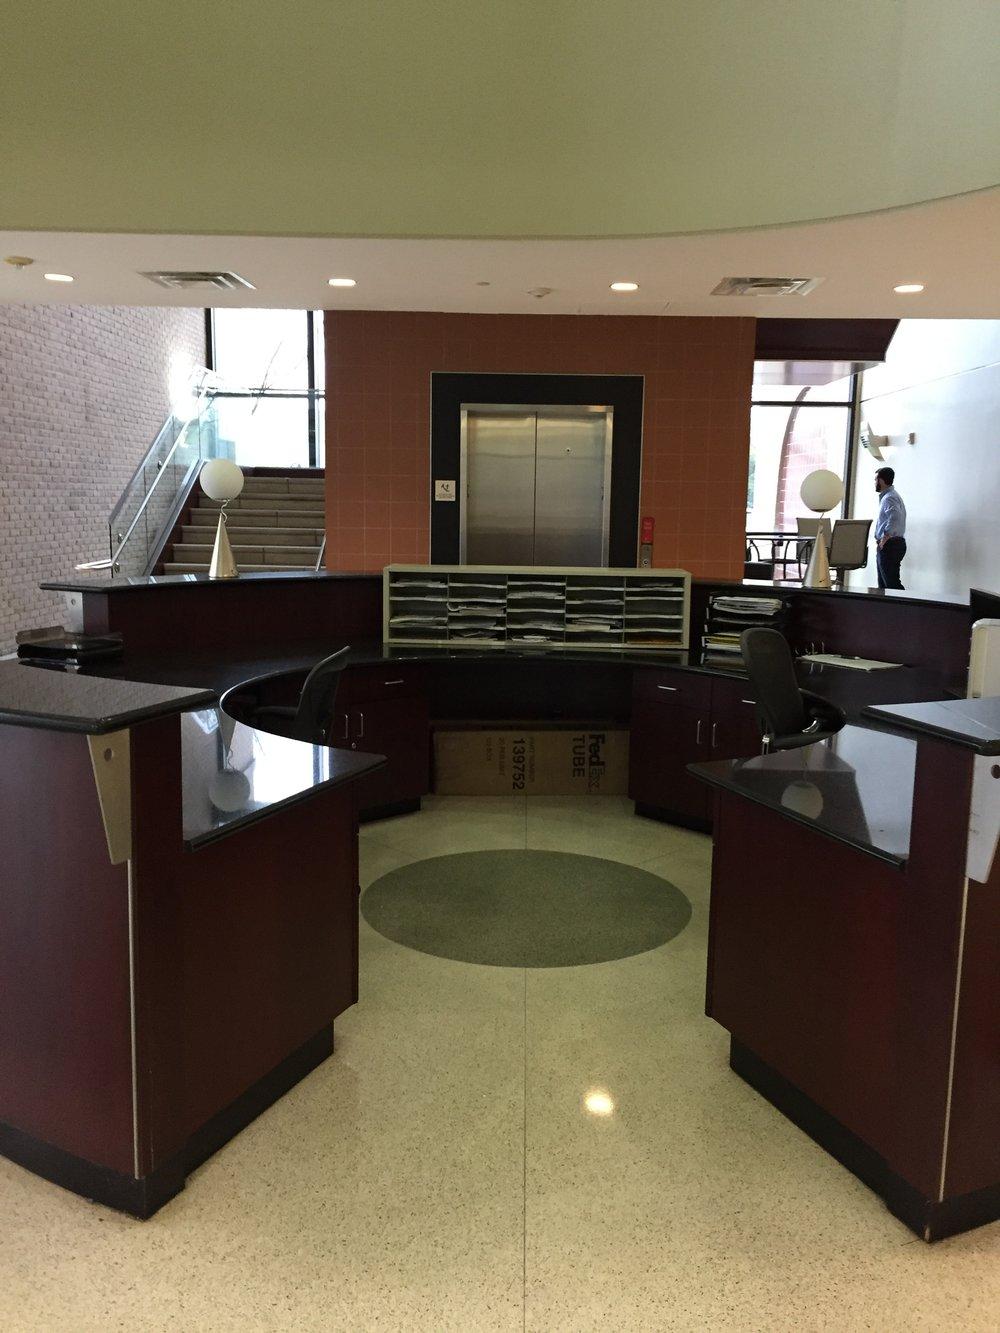 Main Floor: Mail Center